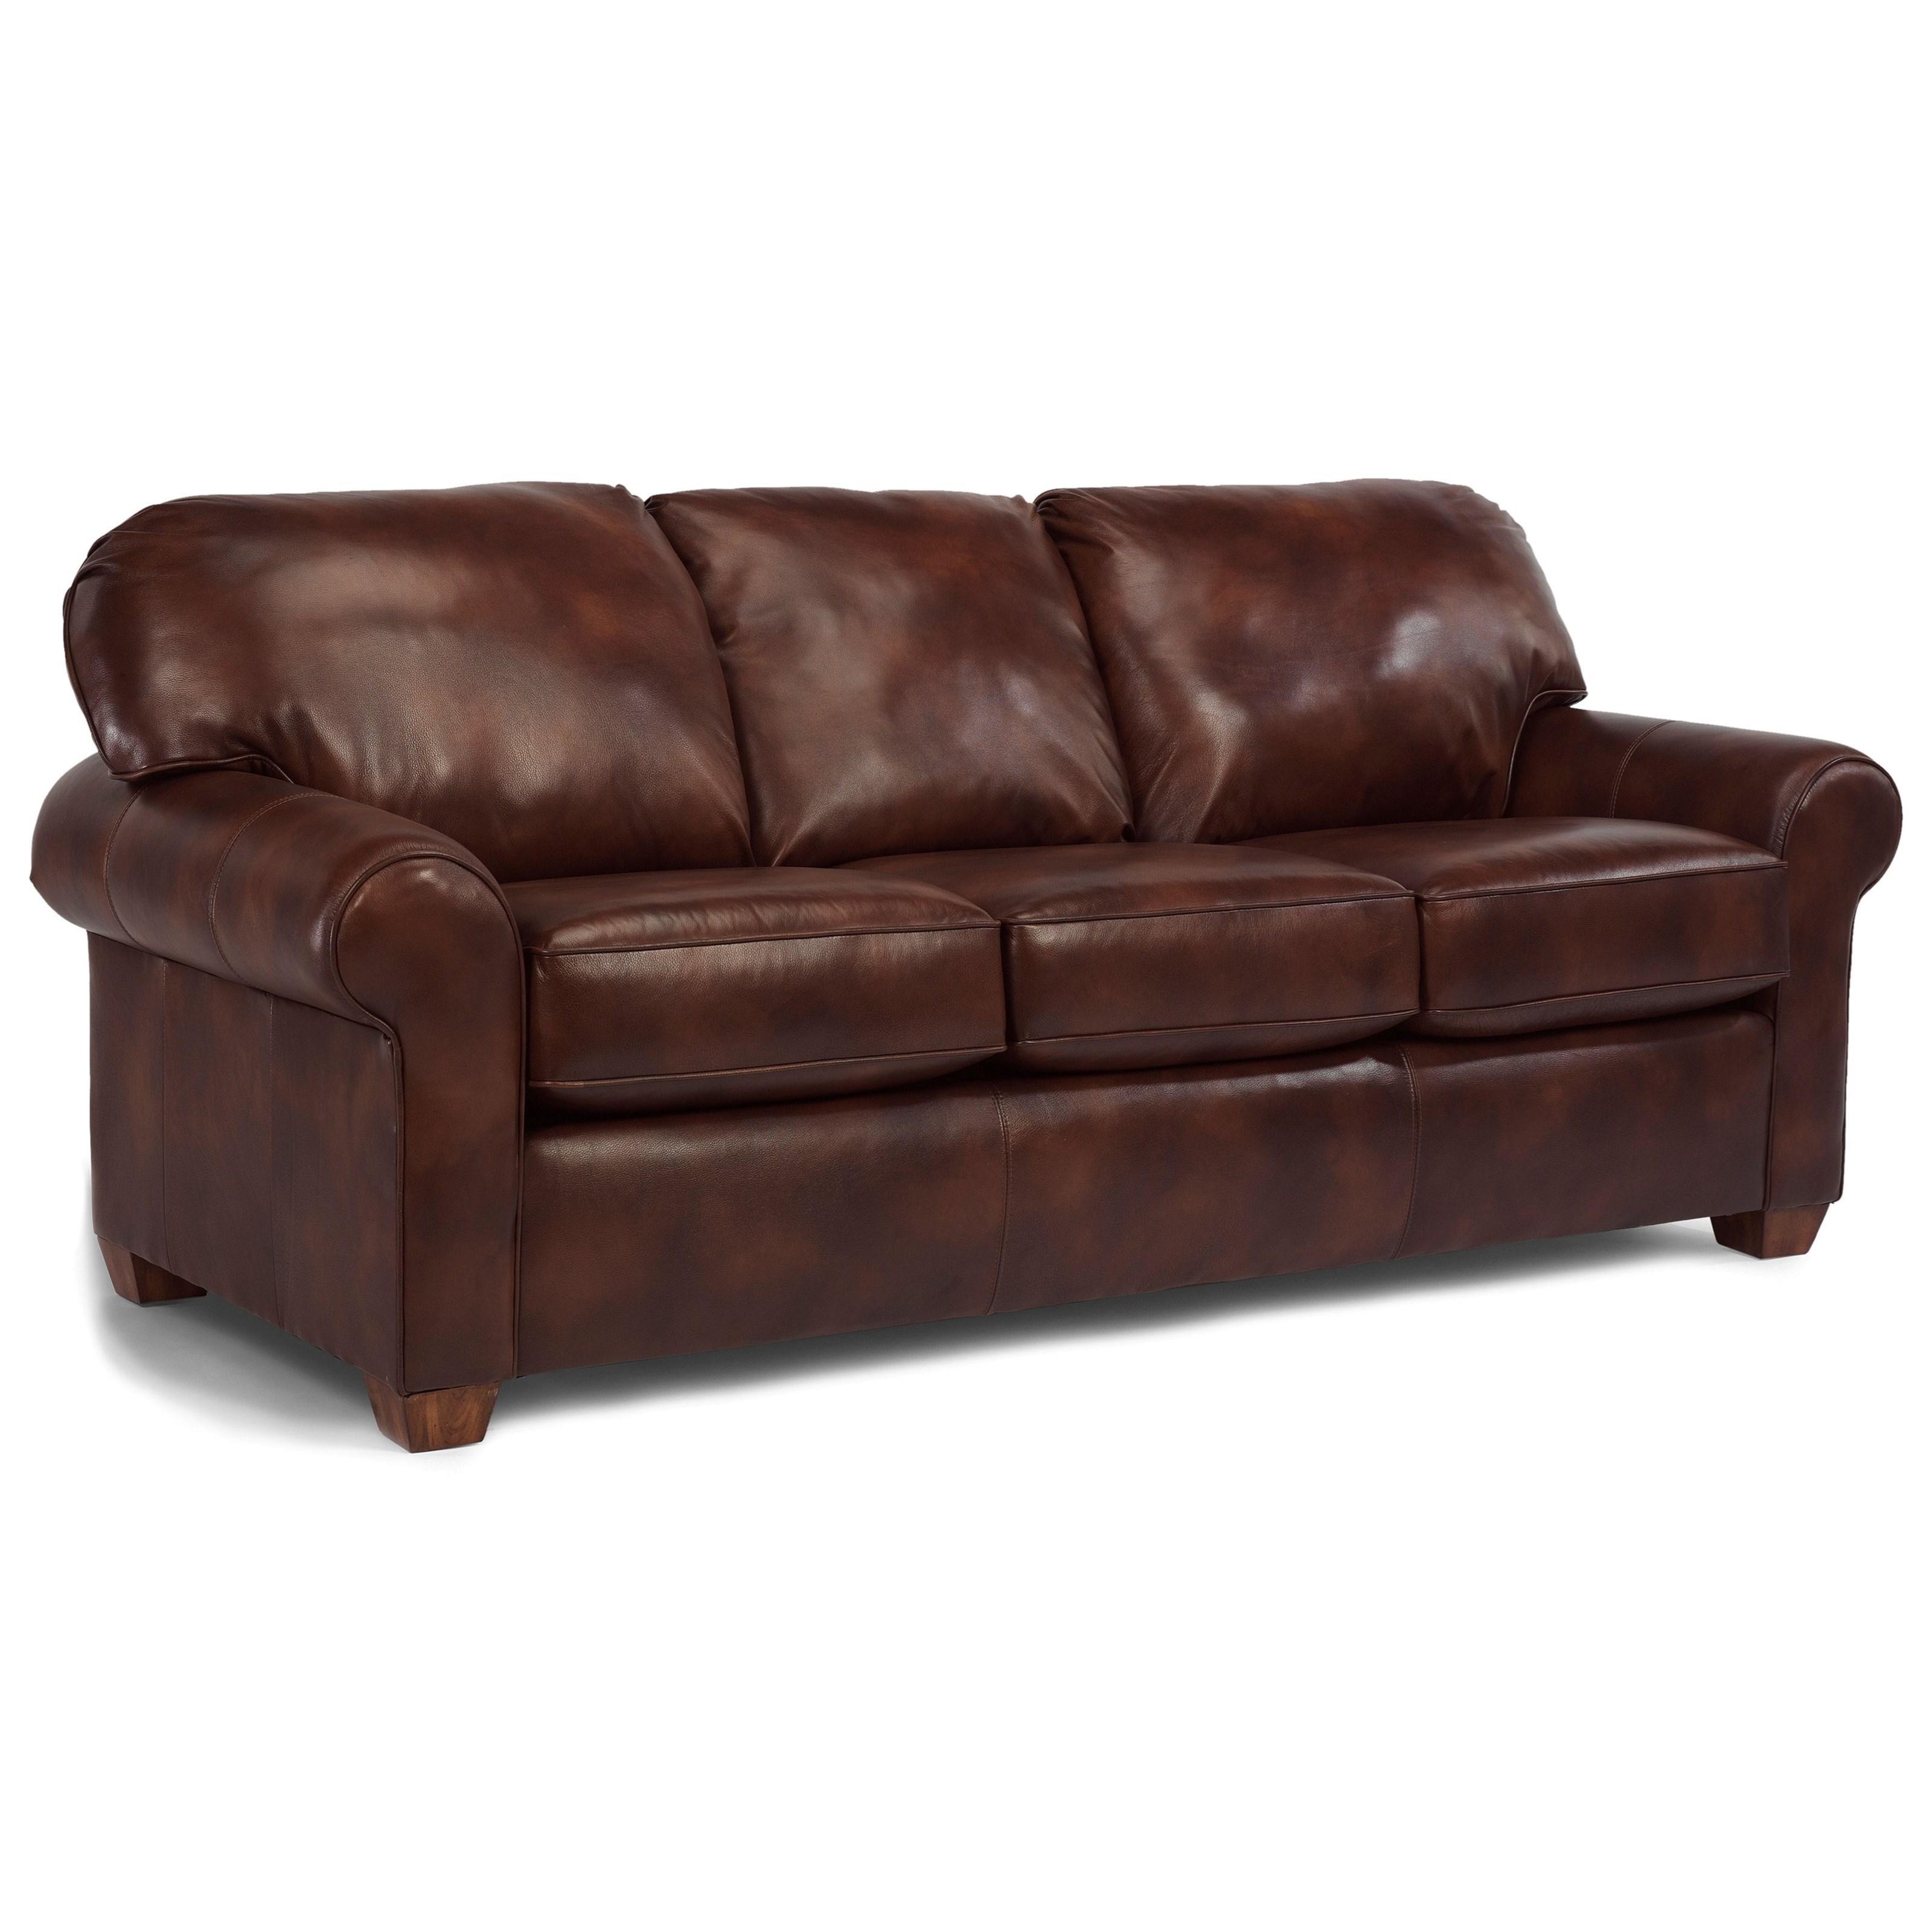 Flexsteel Sofa Bed Mattress: Flexsteel Thornton Stationary Upholstered Sofa